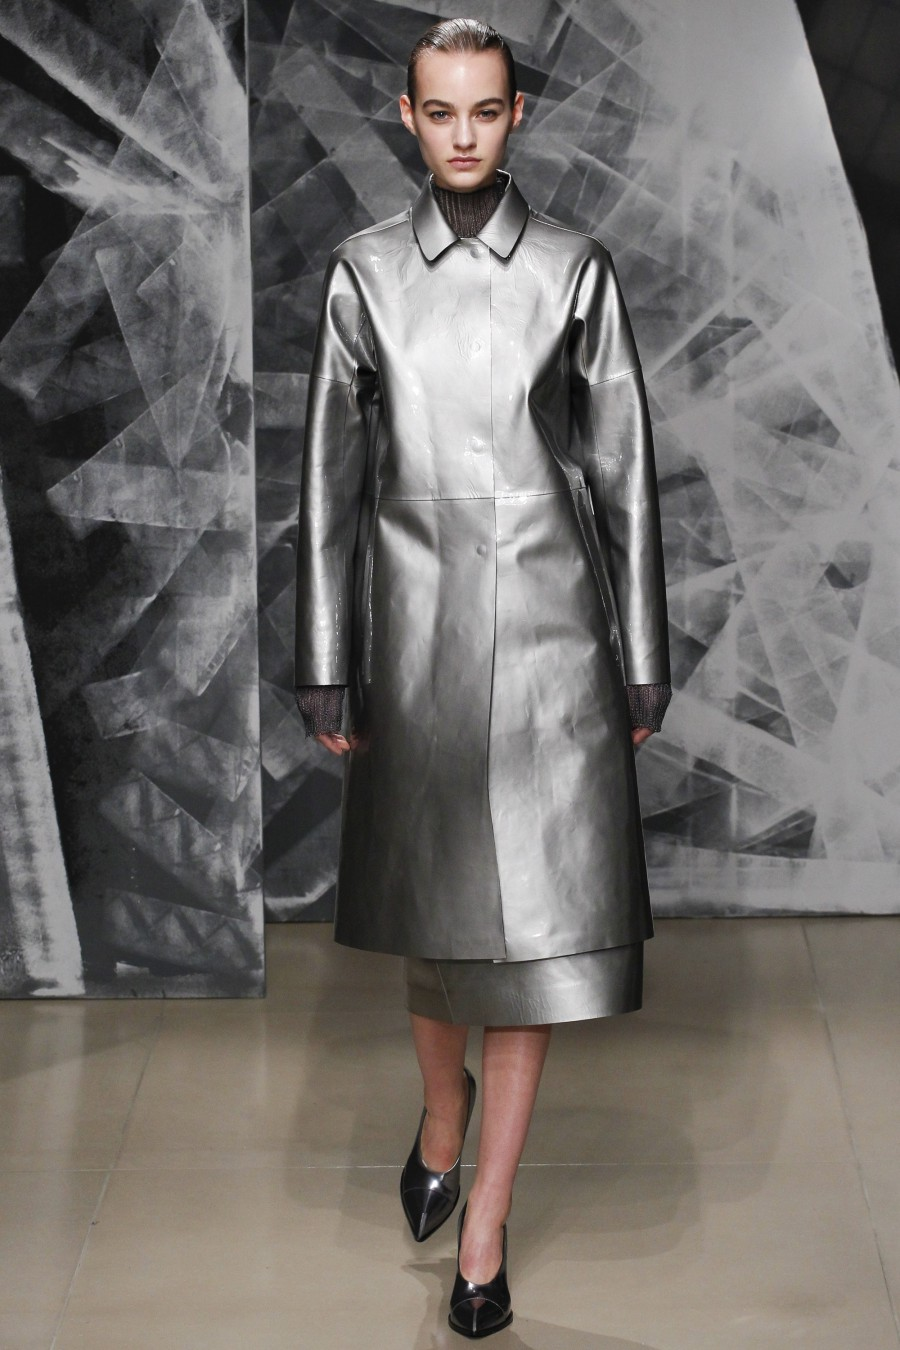 Jil Sander Fall 2016 Collection, Minimalist Fahsion, Minimal Trend, How To Minimal, Minimal Style, 2016 Minimalist, Minimalist Blog, Fashion Week, Minimal Clothes, Minimal Brand, Minimal Clothing